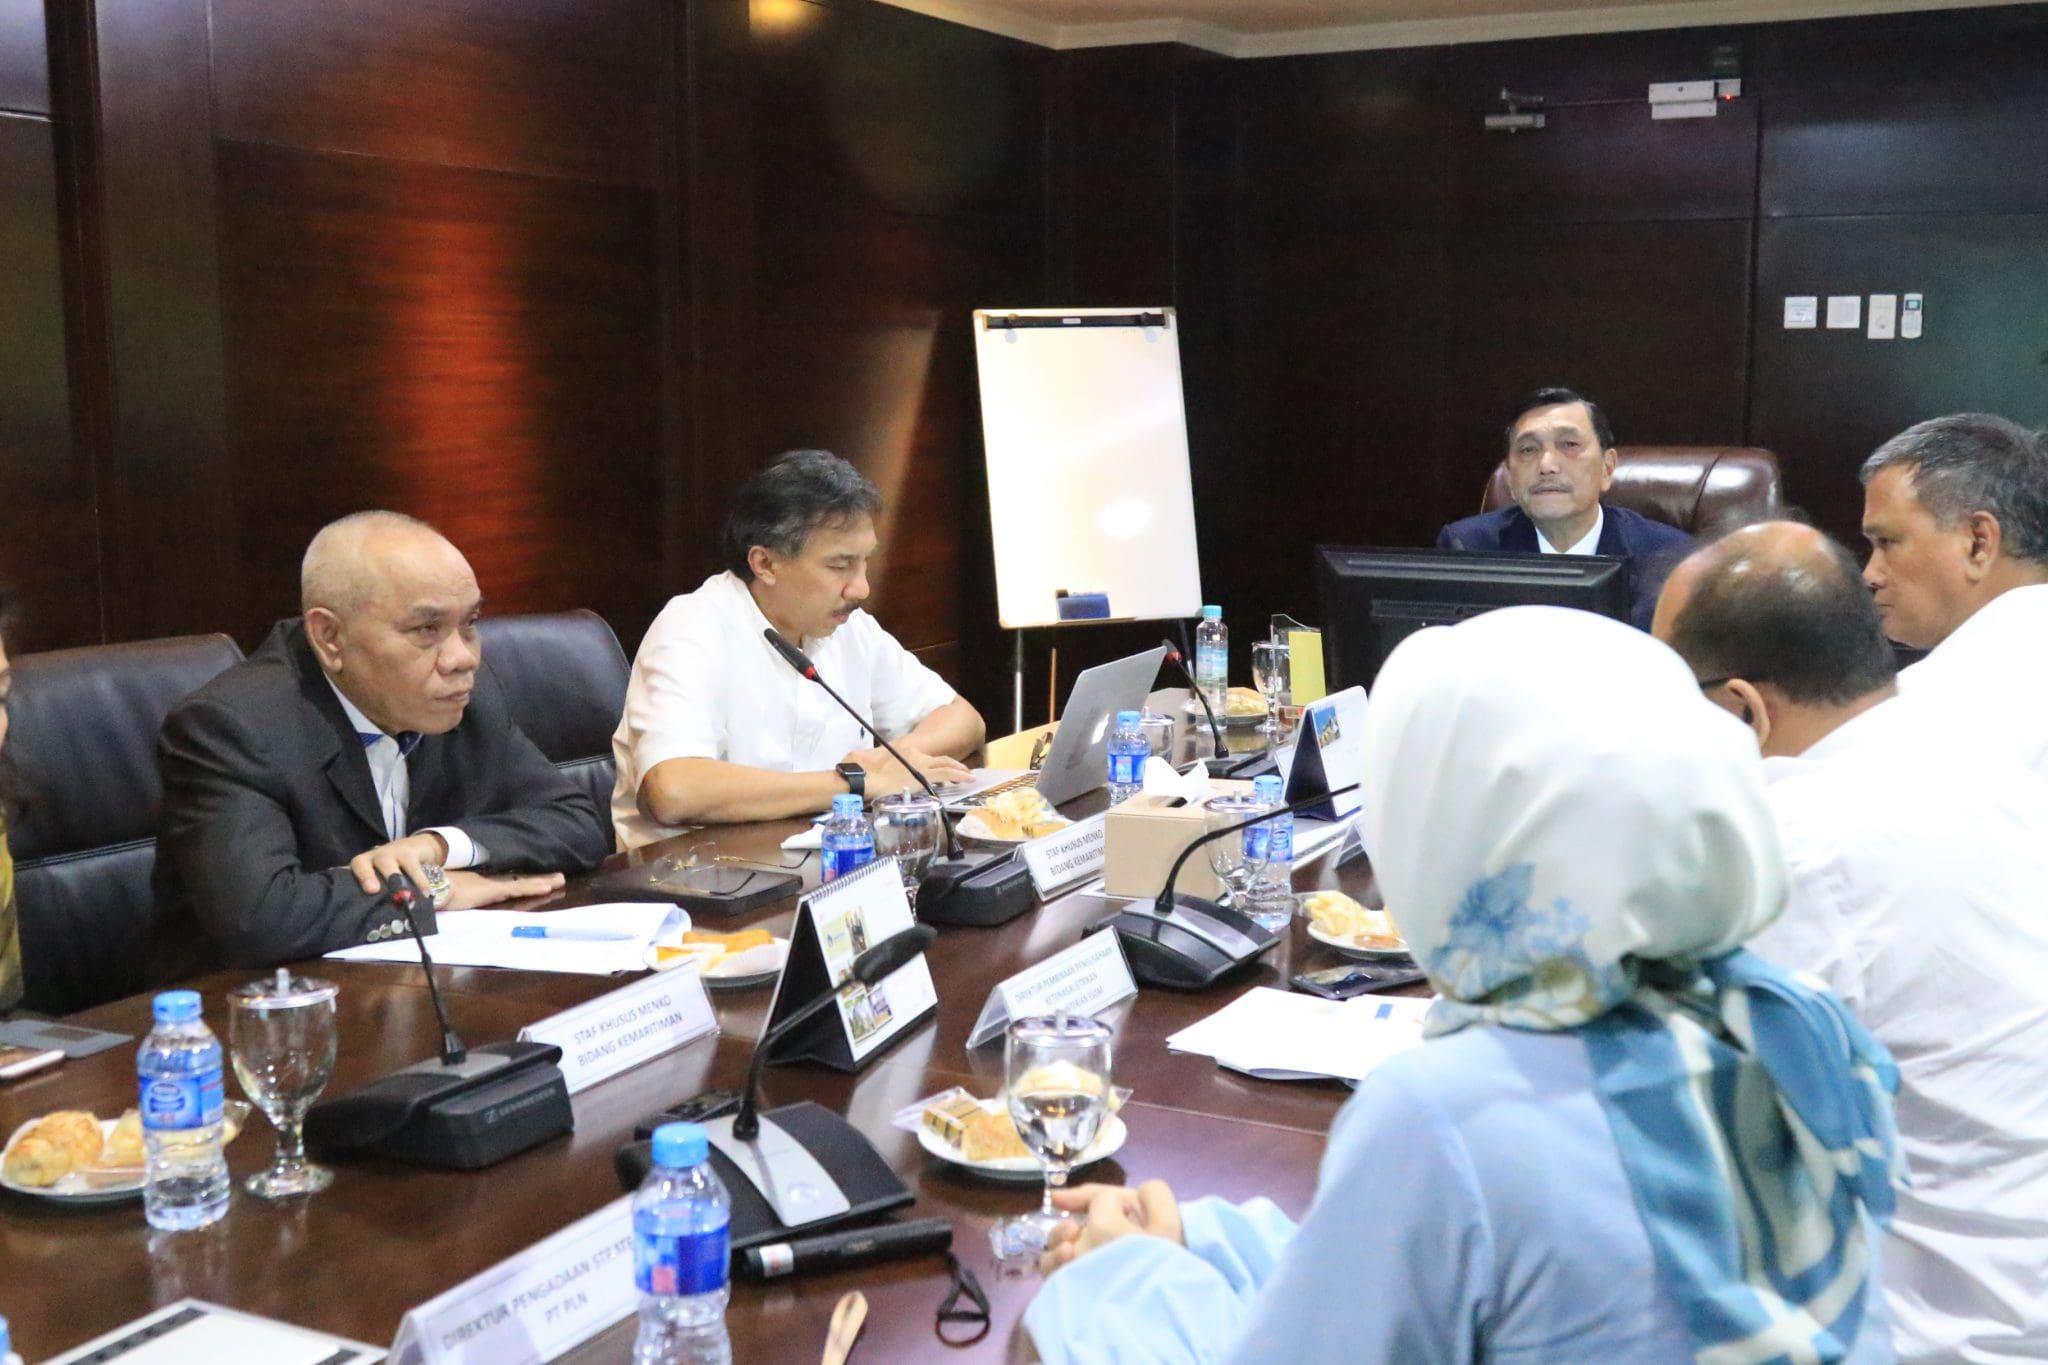 Menko Luhut pimpin Rapat Tindak Lanjut Kerjasama Indonesia-Singapore tentang Suplai Gas (LNG) untuk Tenaga Listrik